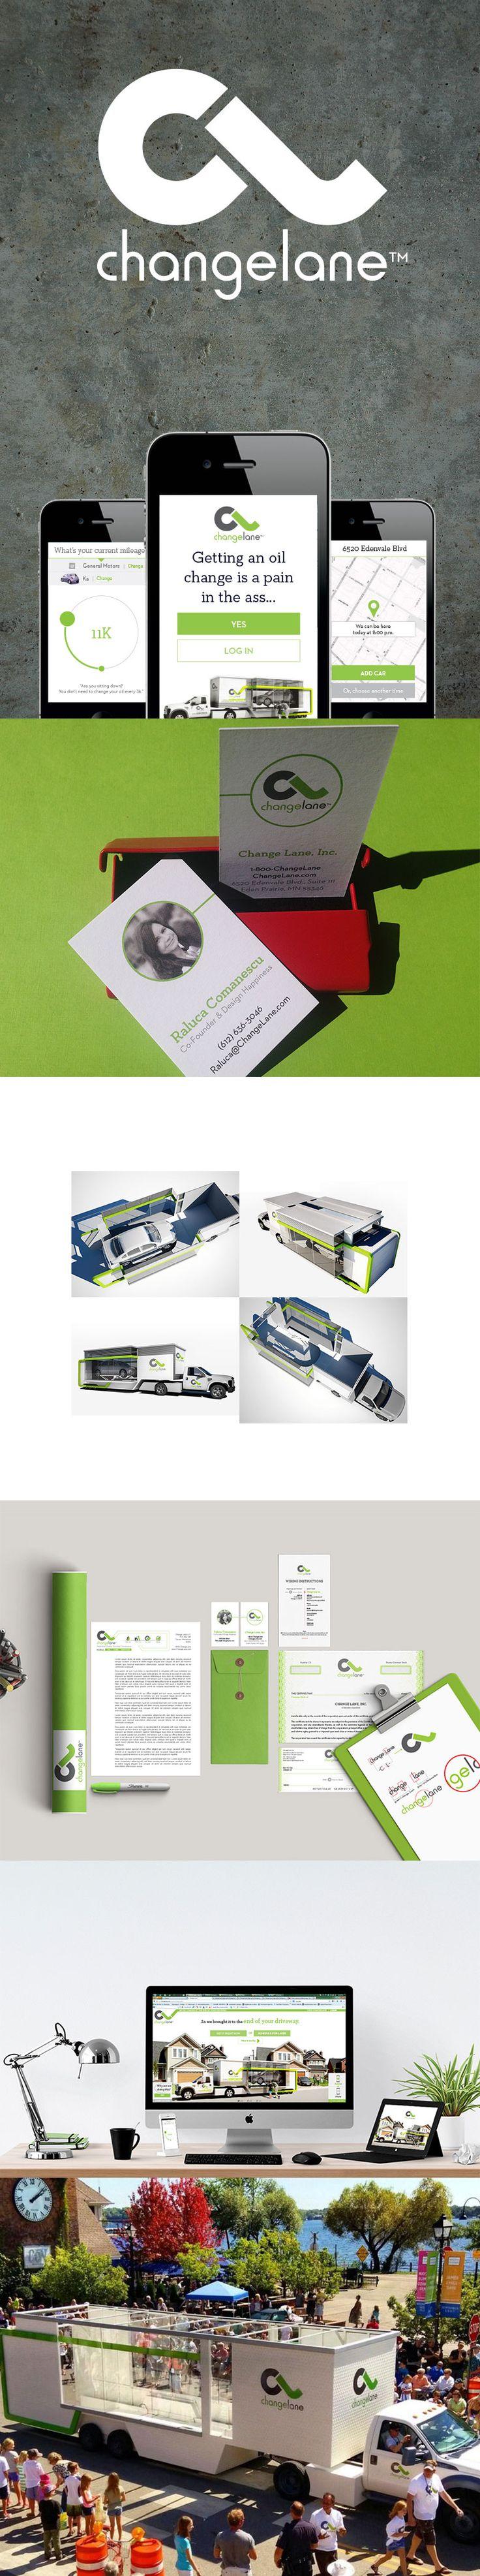 Changelane Automobile Service — UnfoldAtelier: Boost Sales with Friendly Design